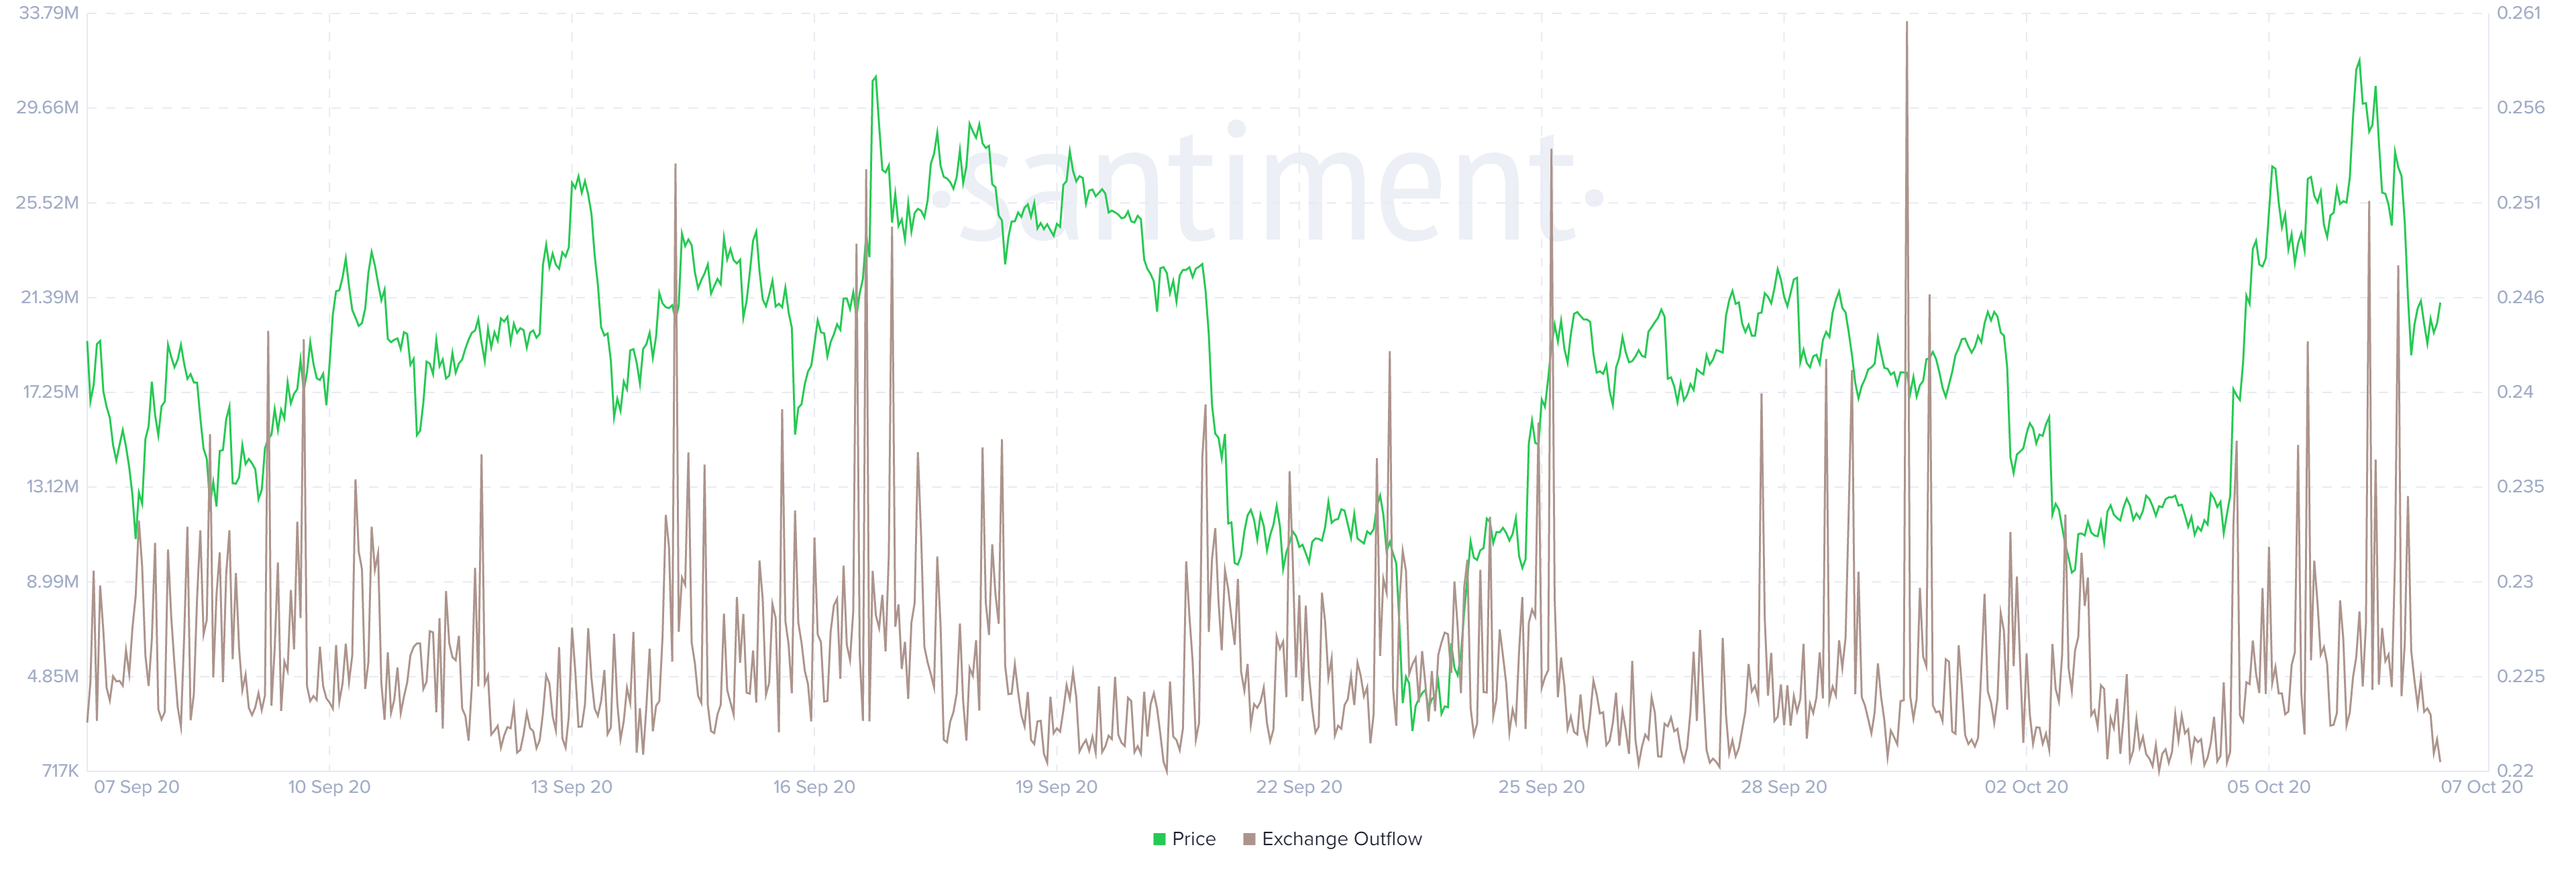 График оттока биржи XRP